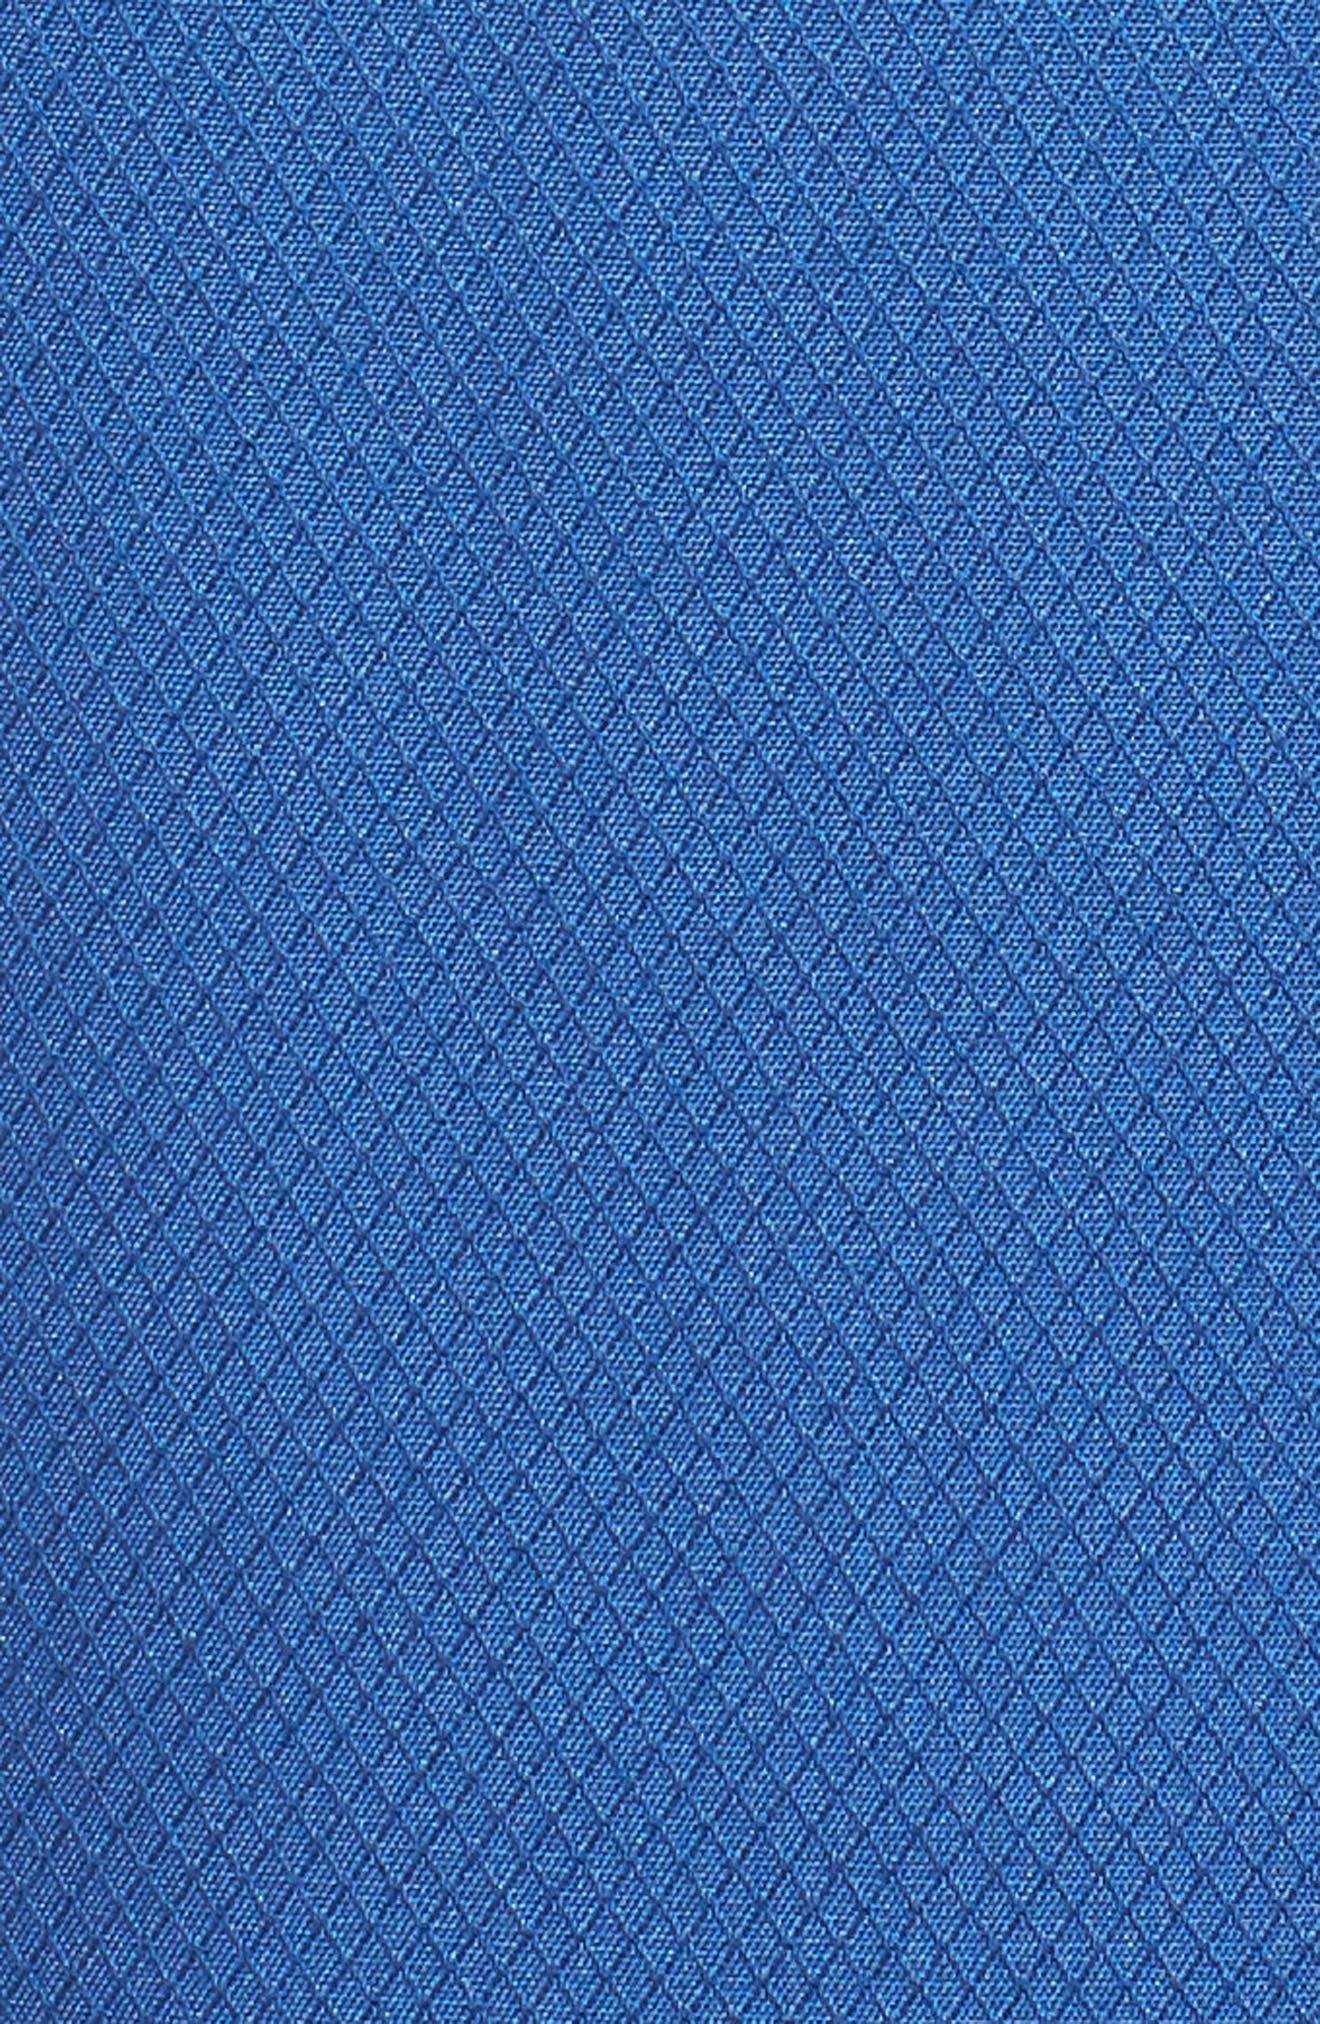 'Honeycomb' Regular Fit Short Sleeve Textured Sport Shirt,                             Alternate thumbnail 9, color,